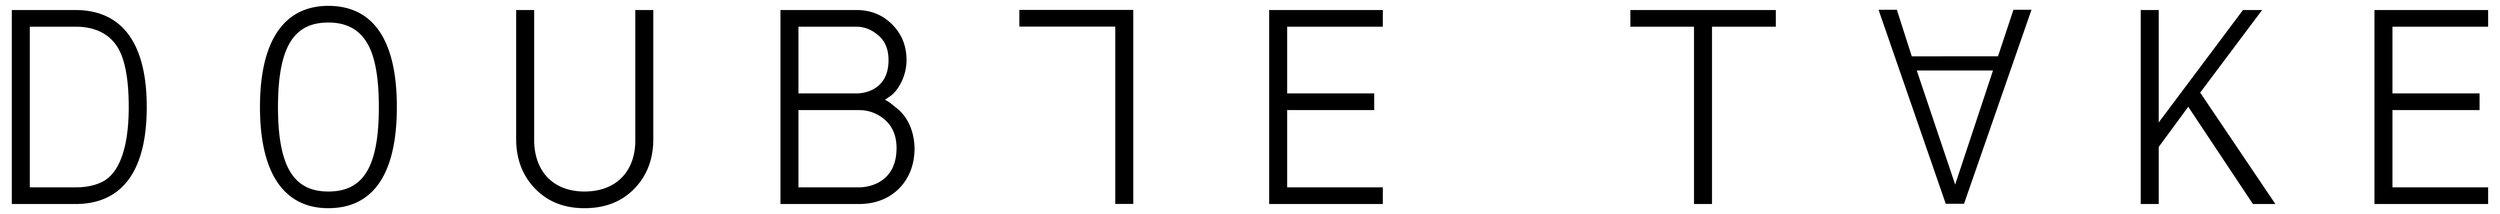 DoubleTake_Logo_Wordmark_Black.jpg